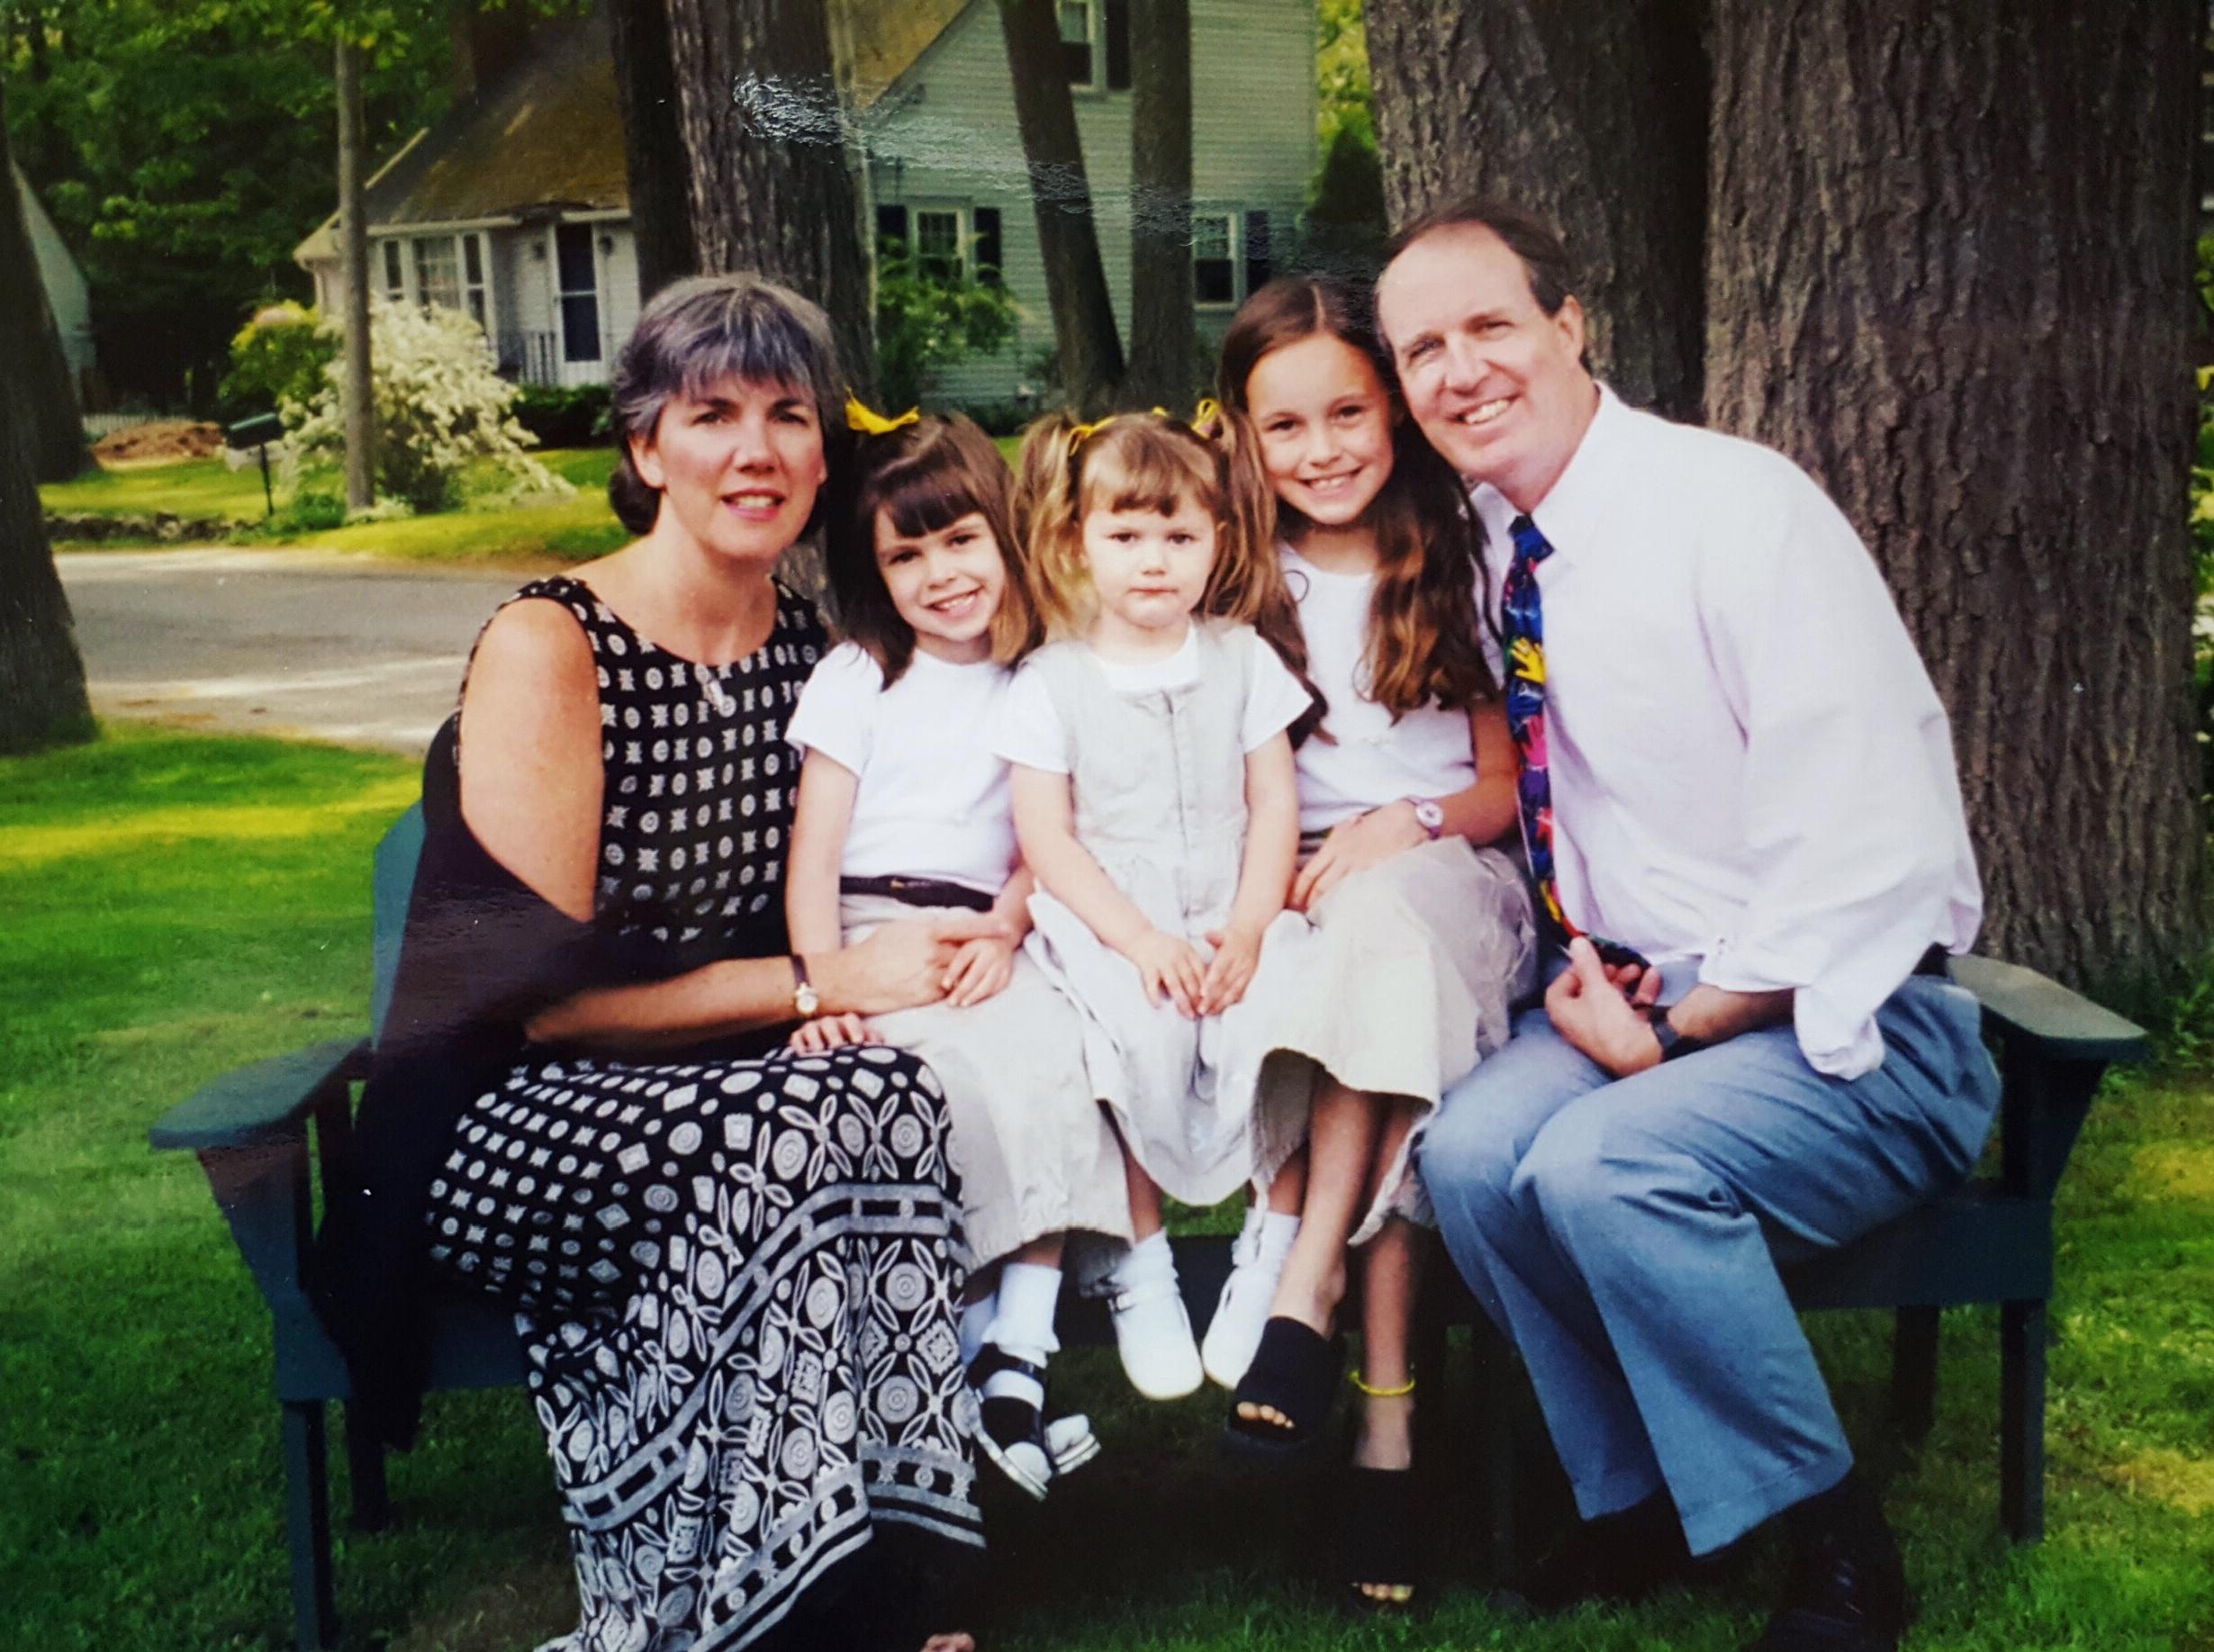 Easter 2001